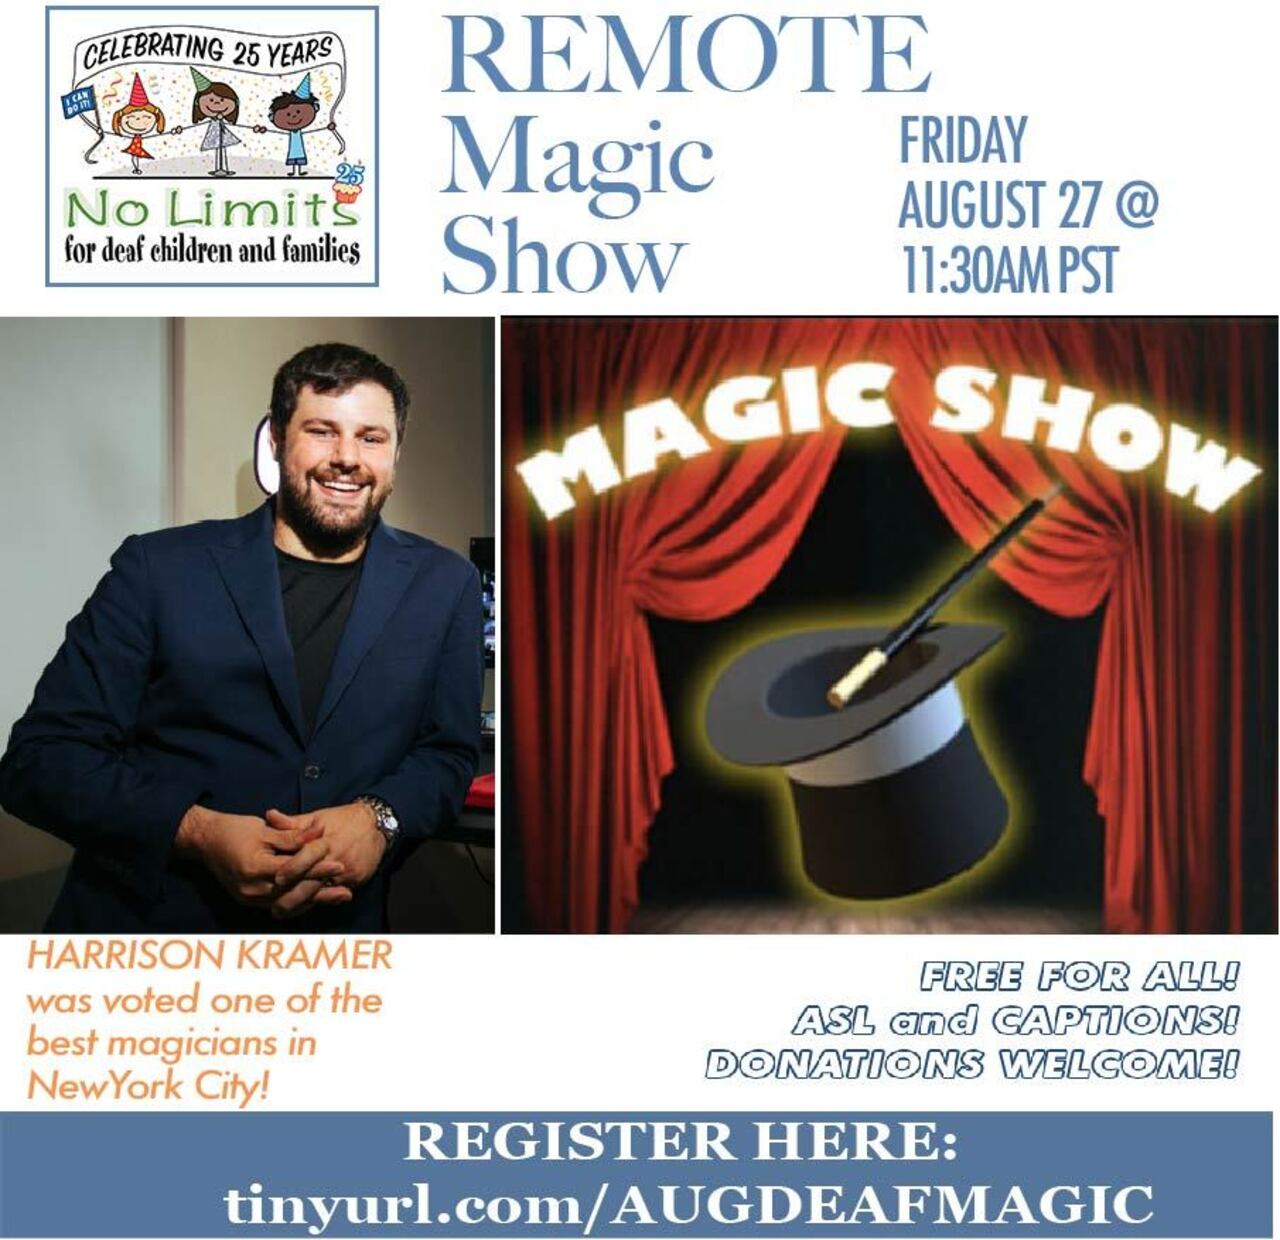 No Limits Magic Show for deaf children-August 27